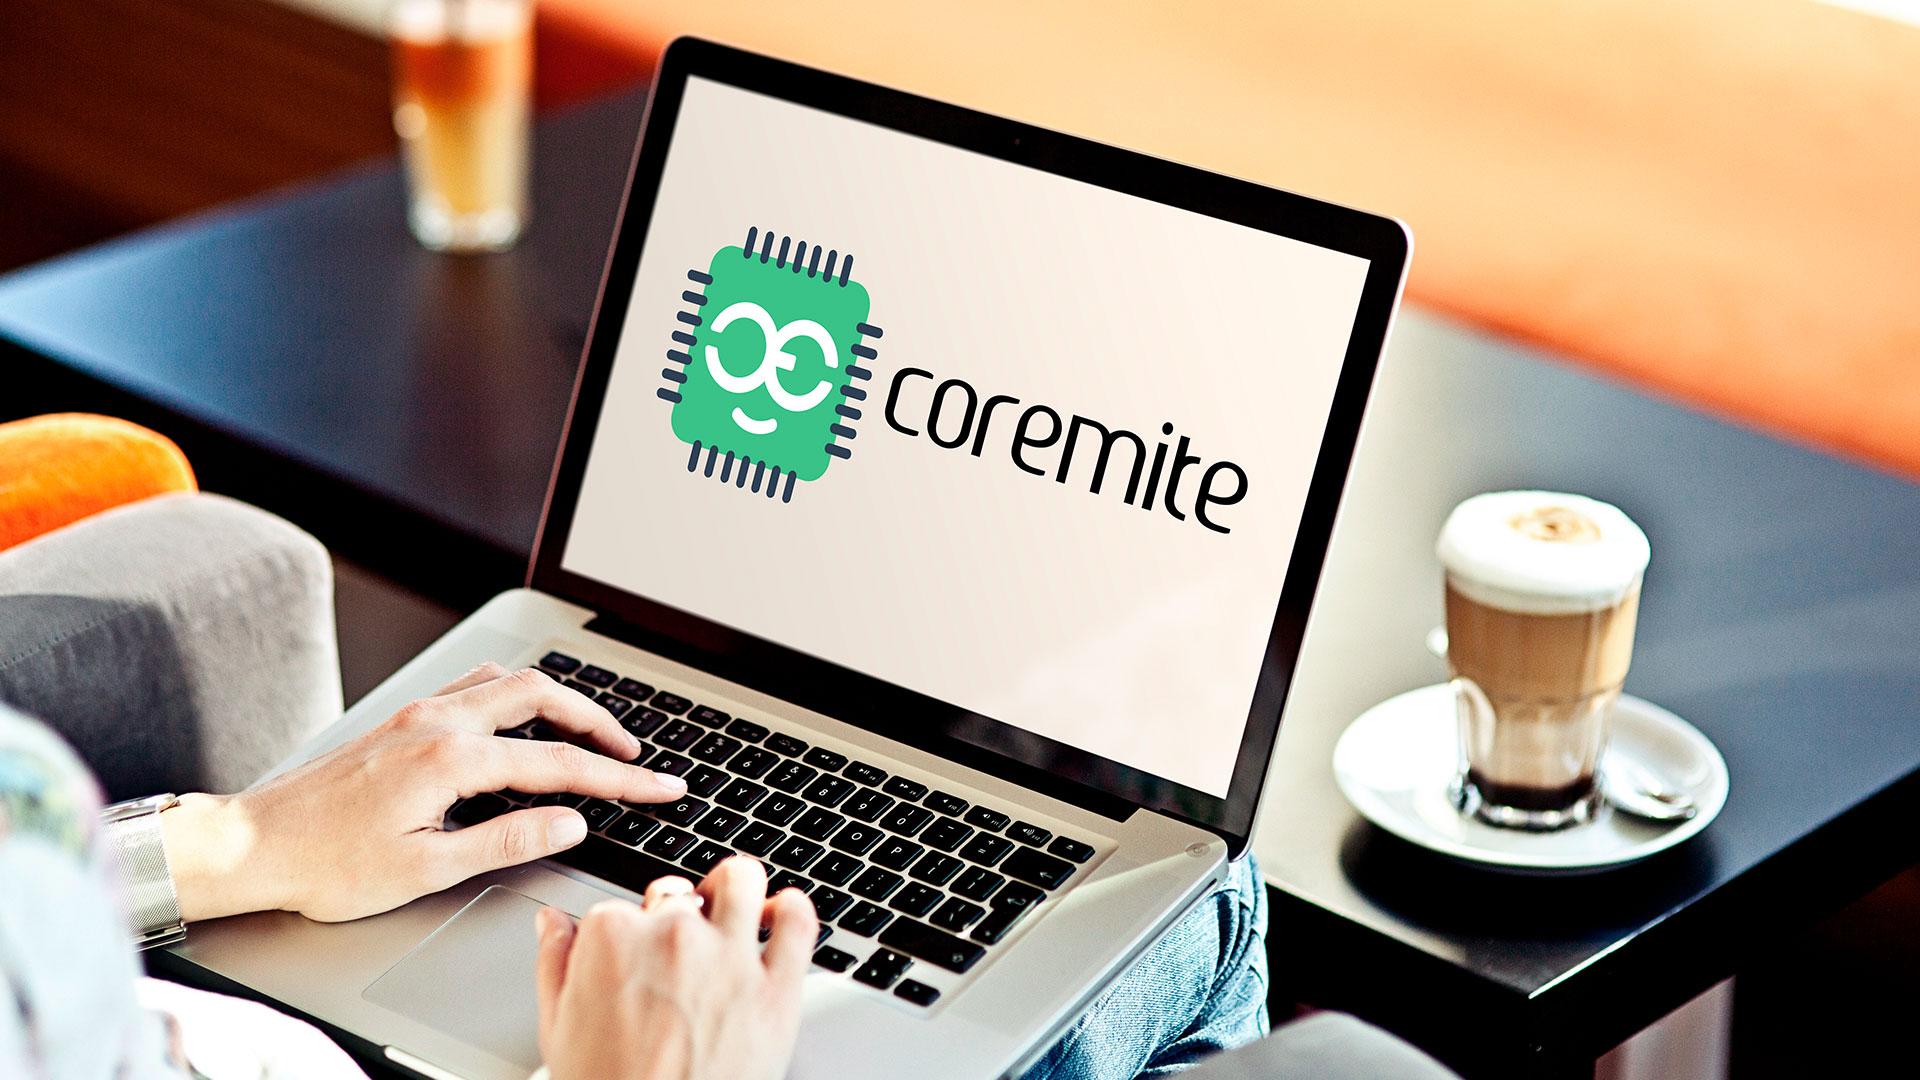 Coremite India Electronics Startup Company Logo Design Presentation